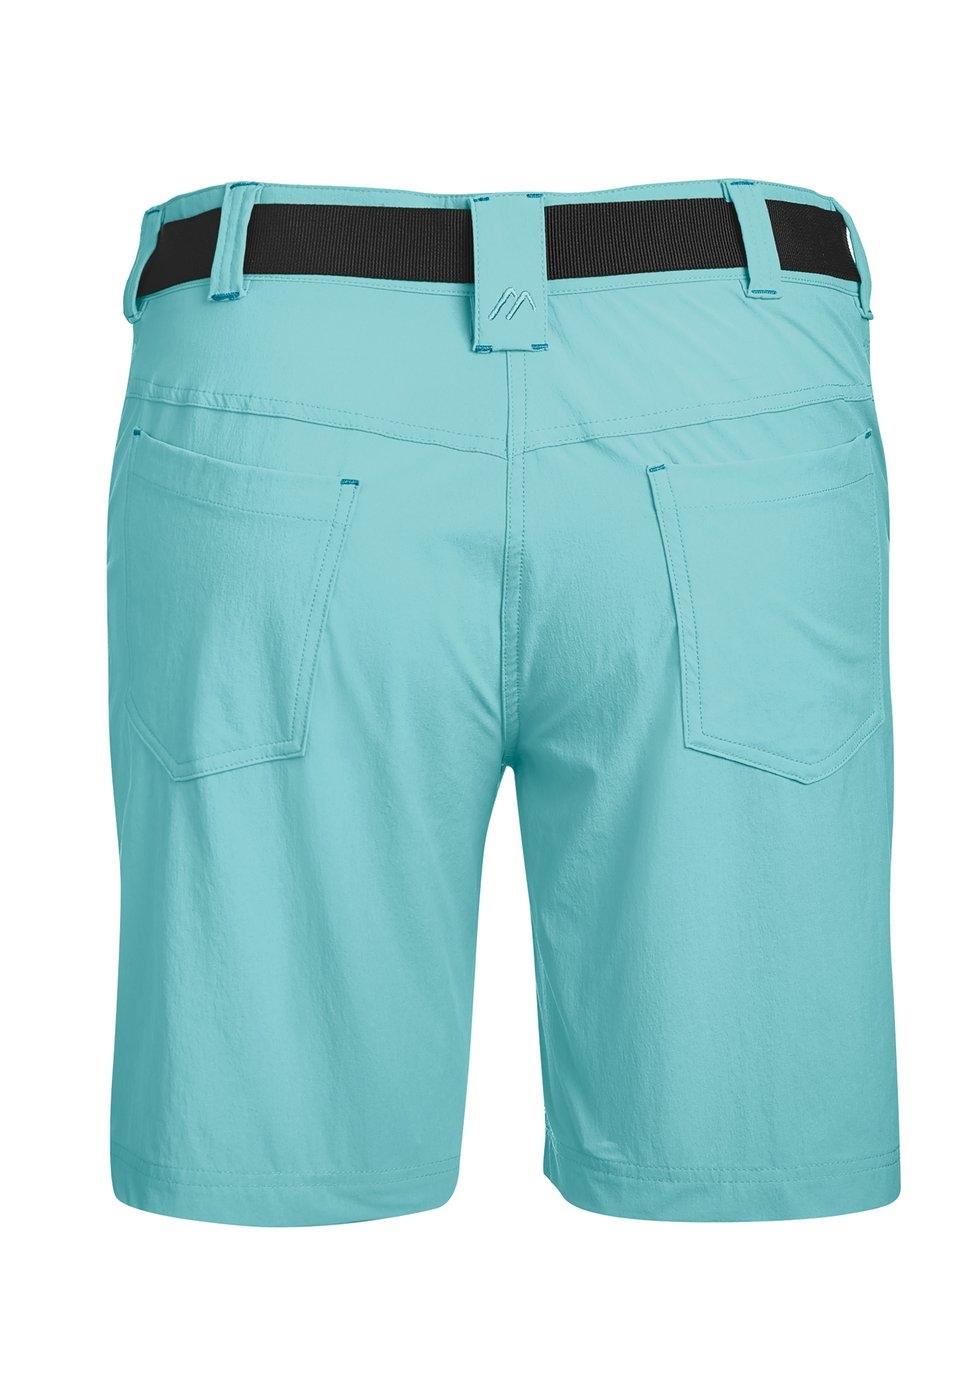 Maier Sports Da. Hose Lulaka Shorts 230010 ice-blau